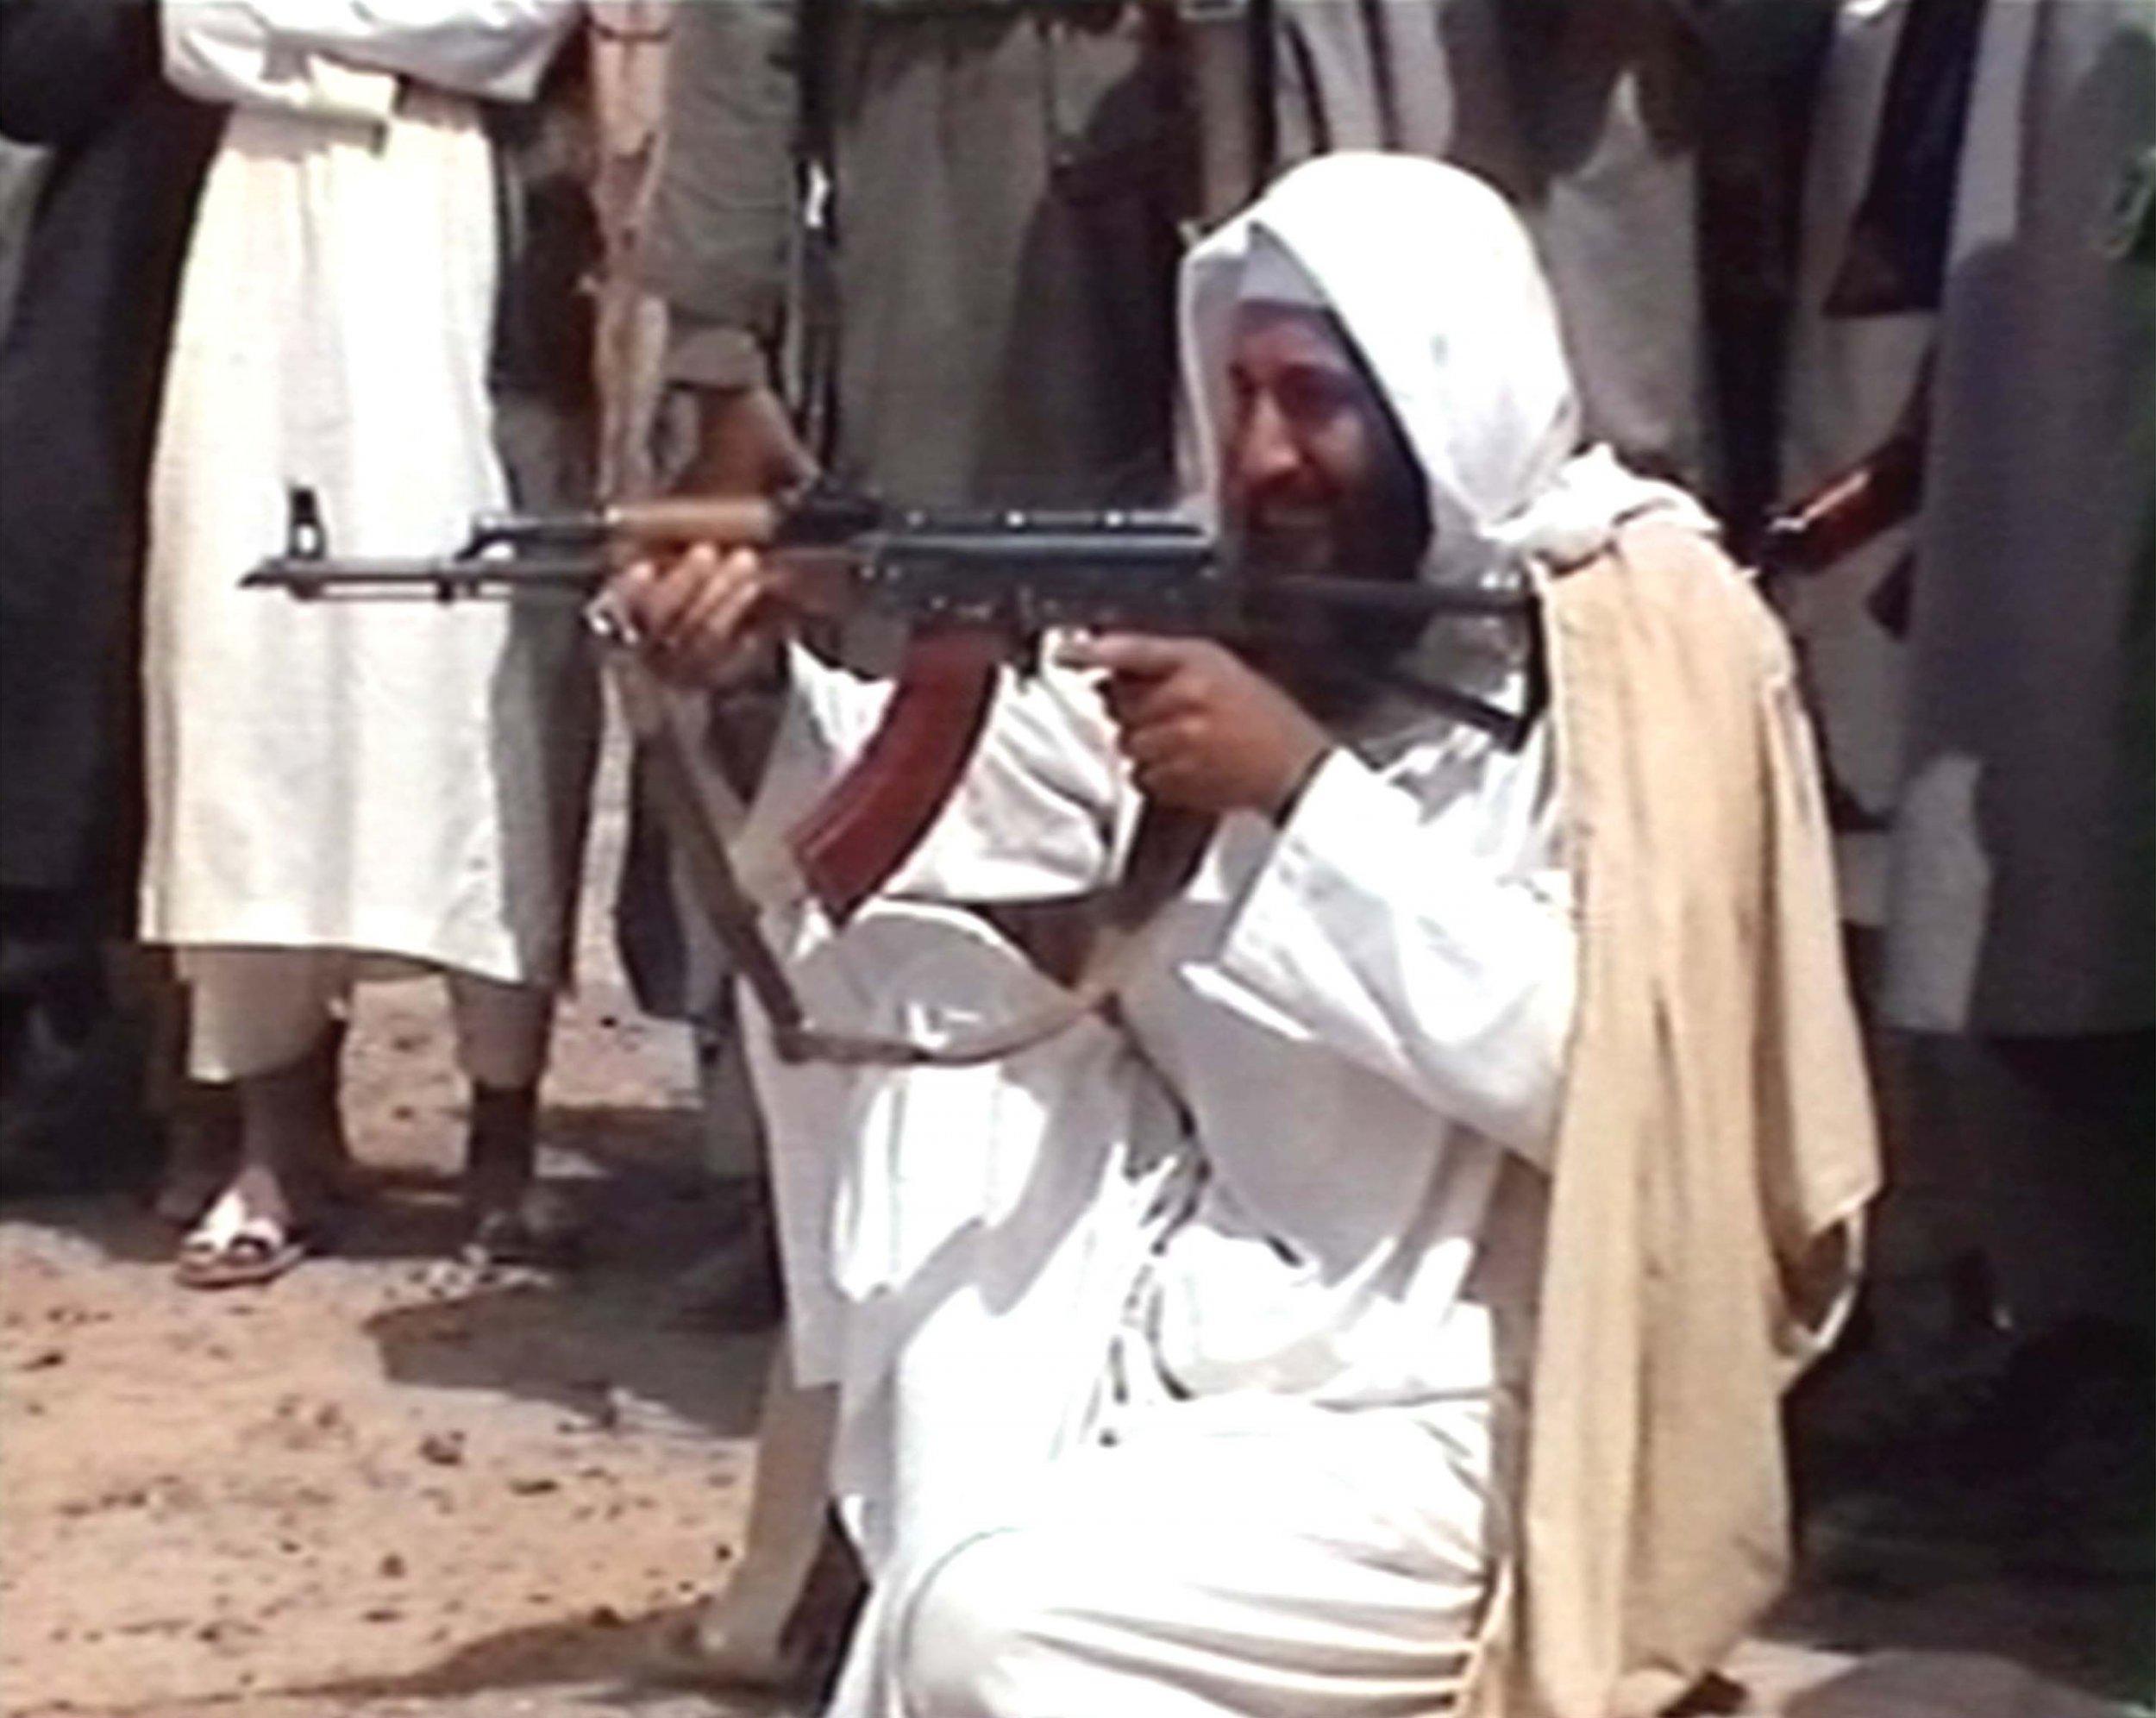 10_12_Canada_Taliban_Afghanistan_bin_Laden